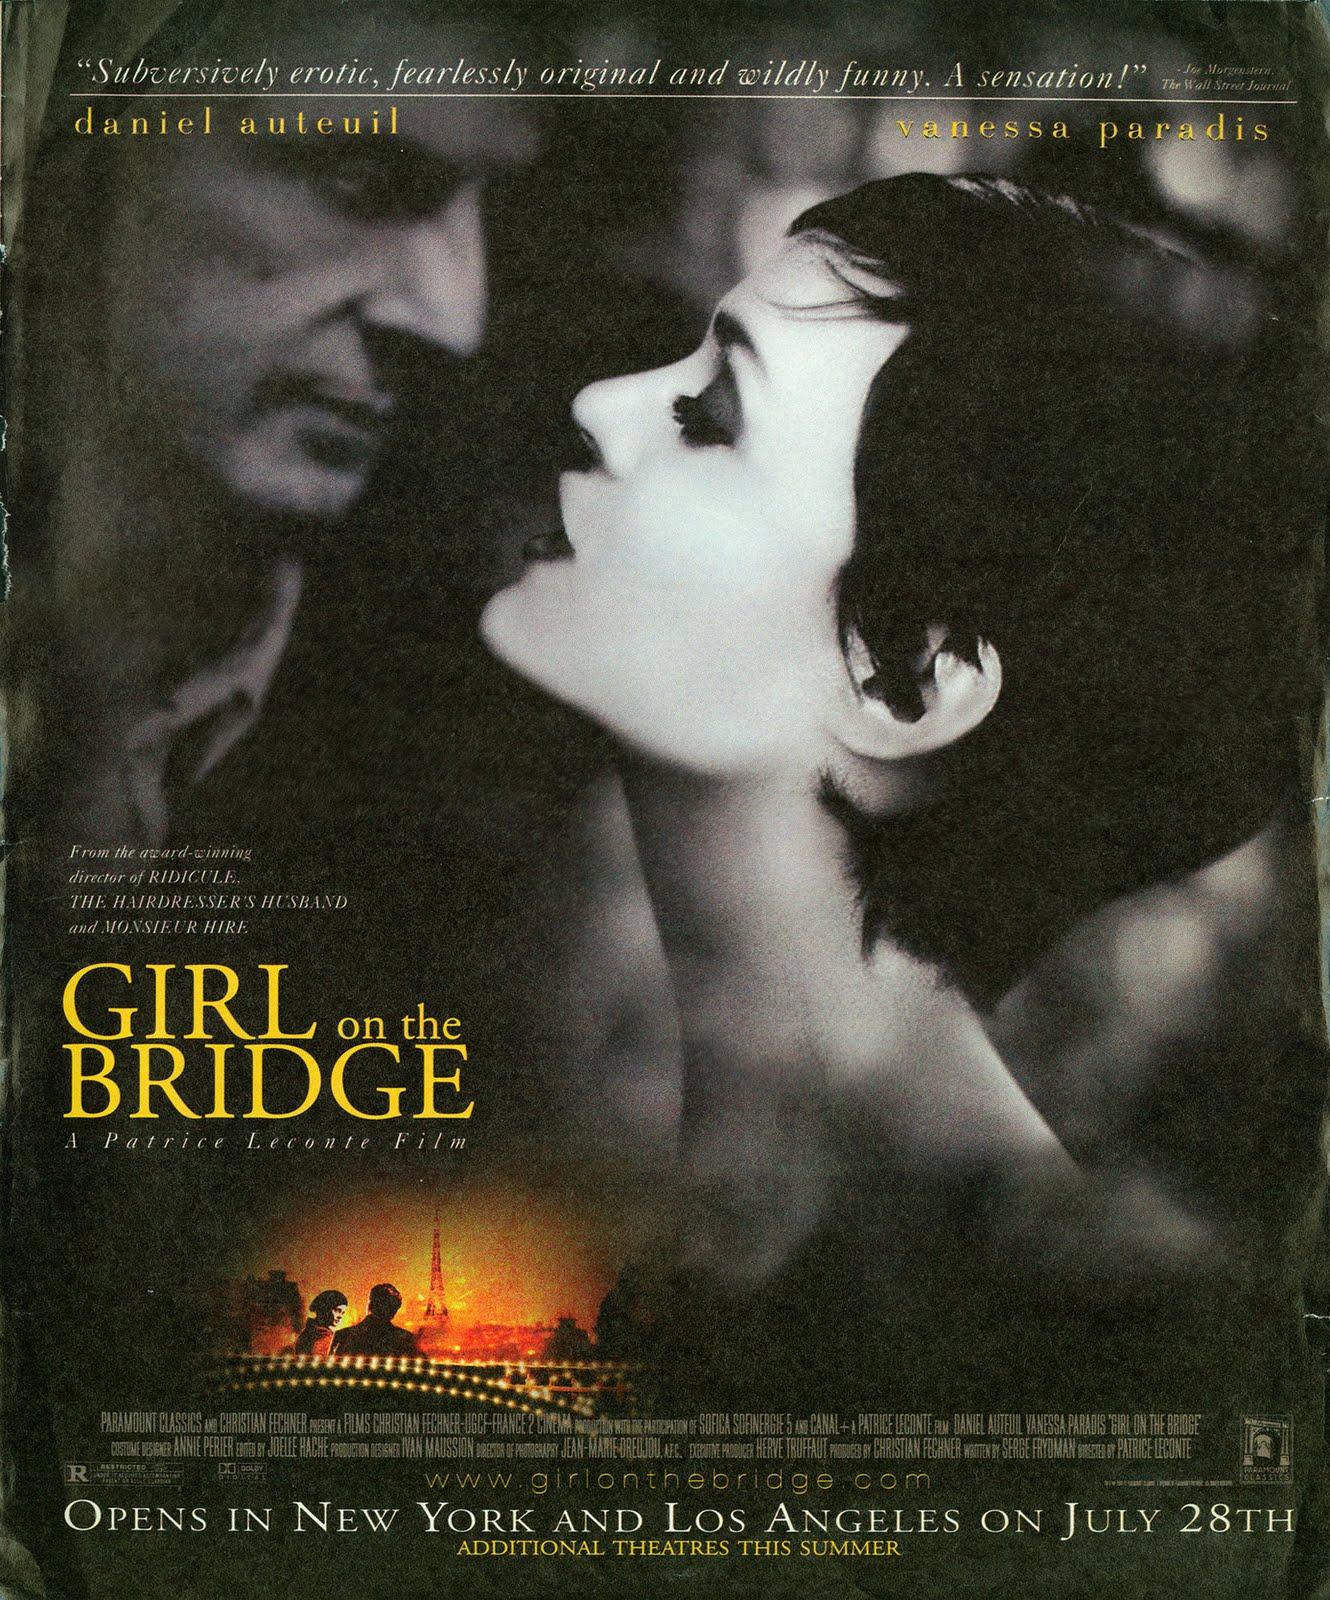 La chica del puente - YouTube